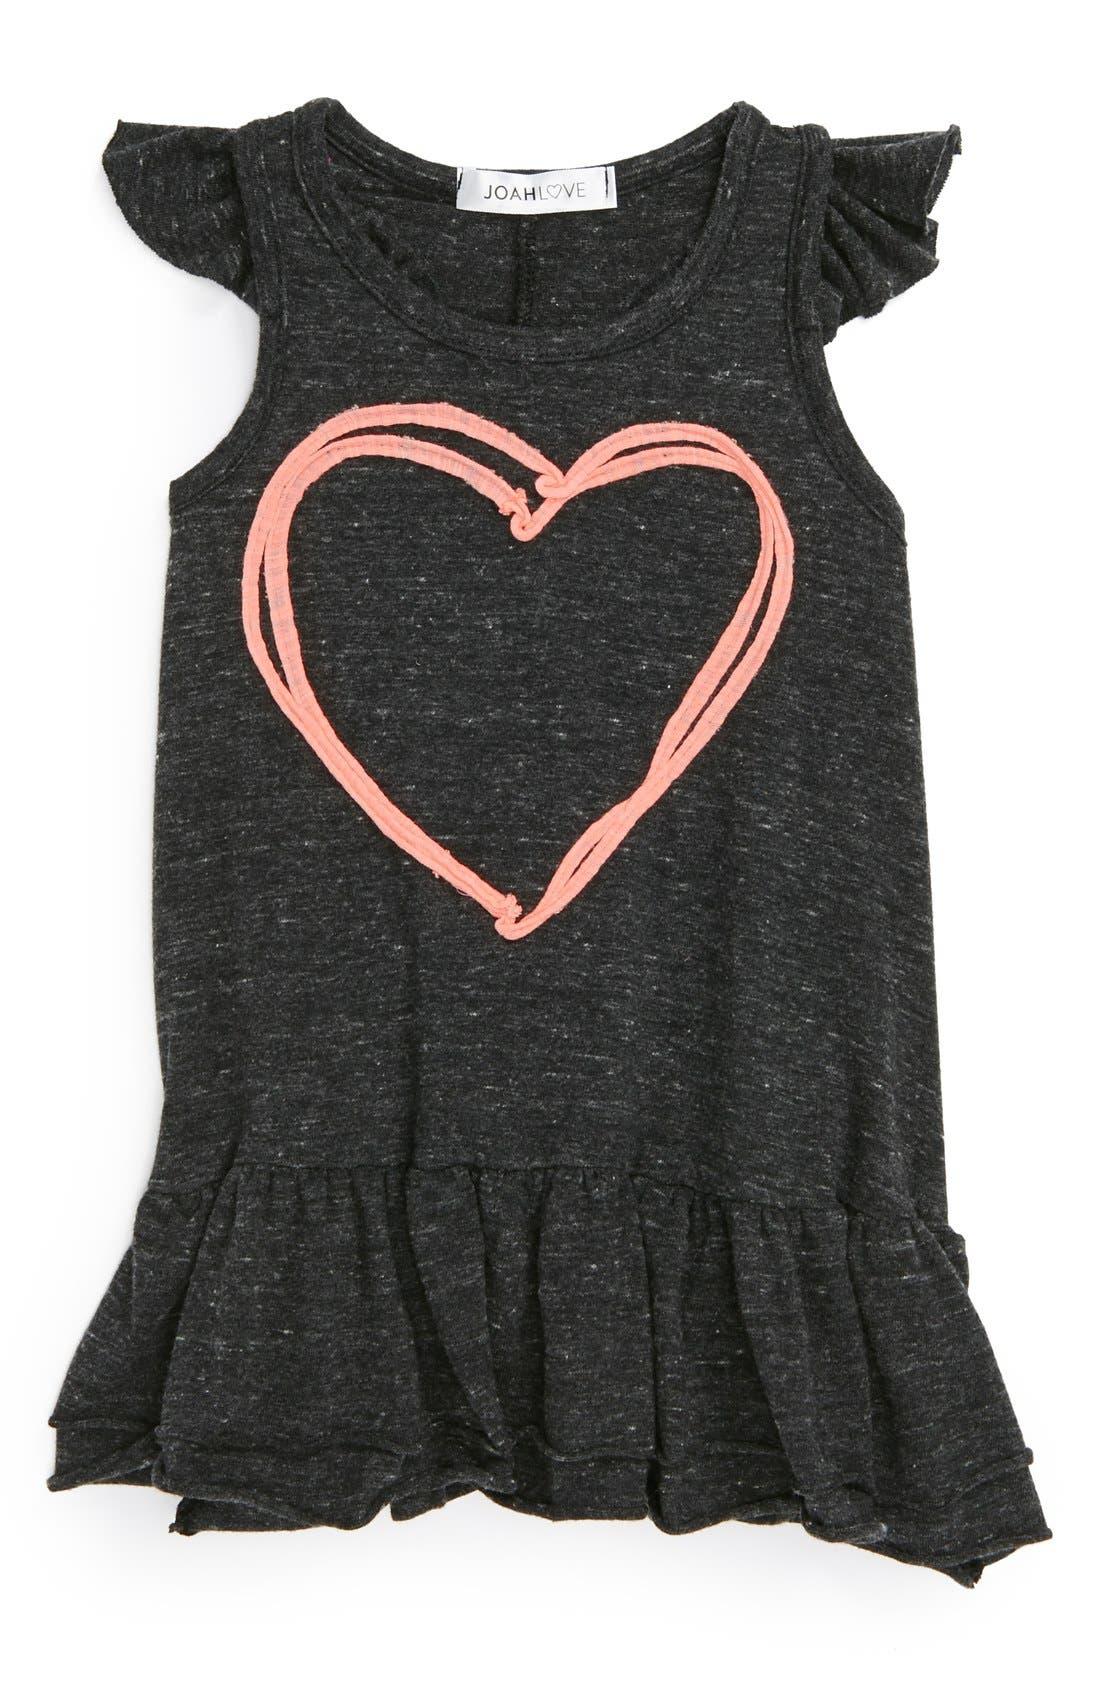 Main Image - Joah Love 'Heart' Ruffle Dress (Baby Girls)